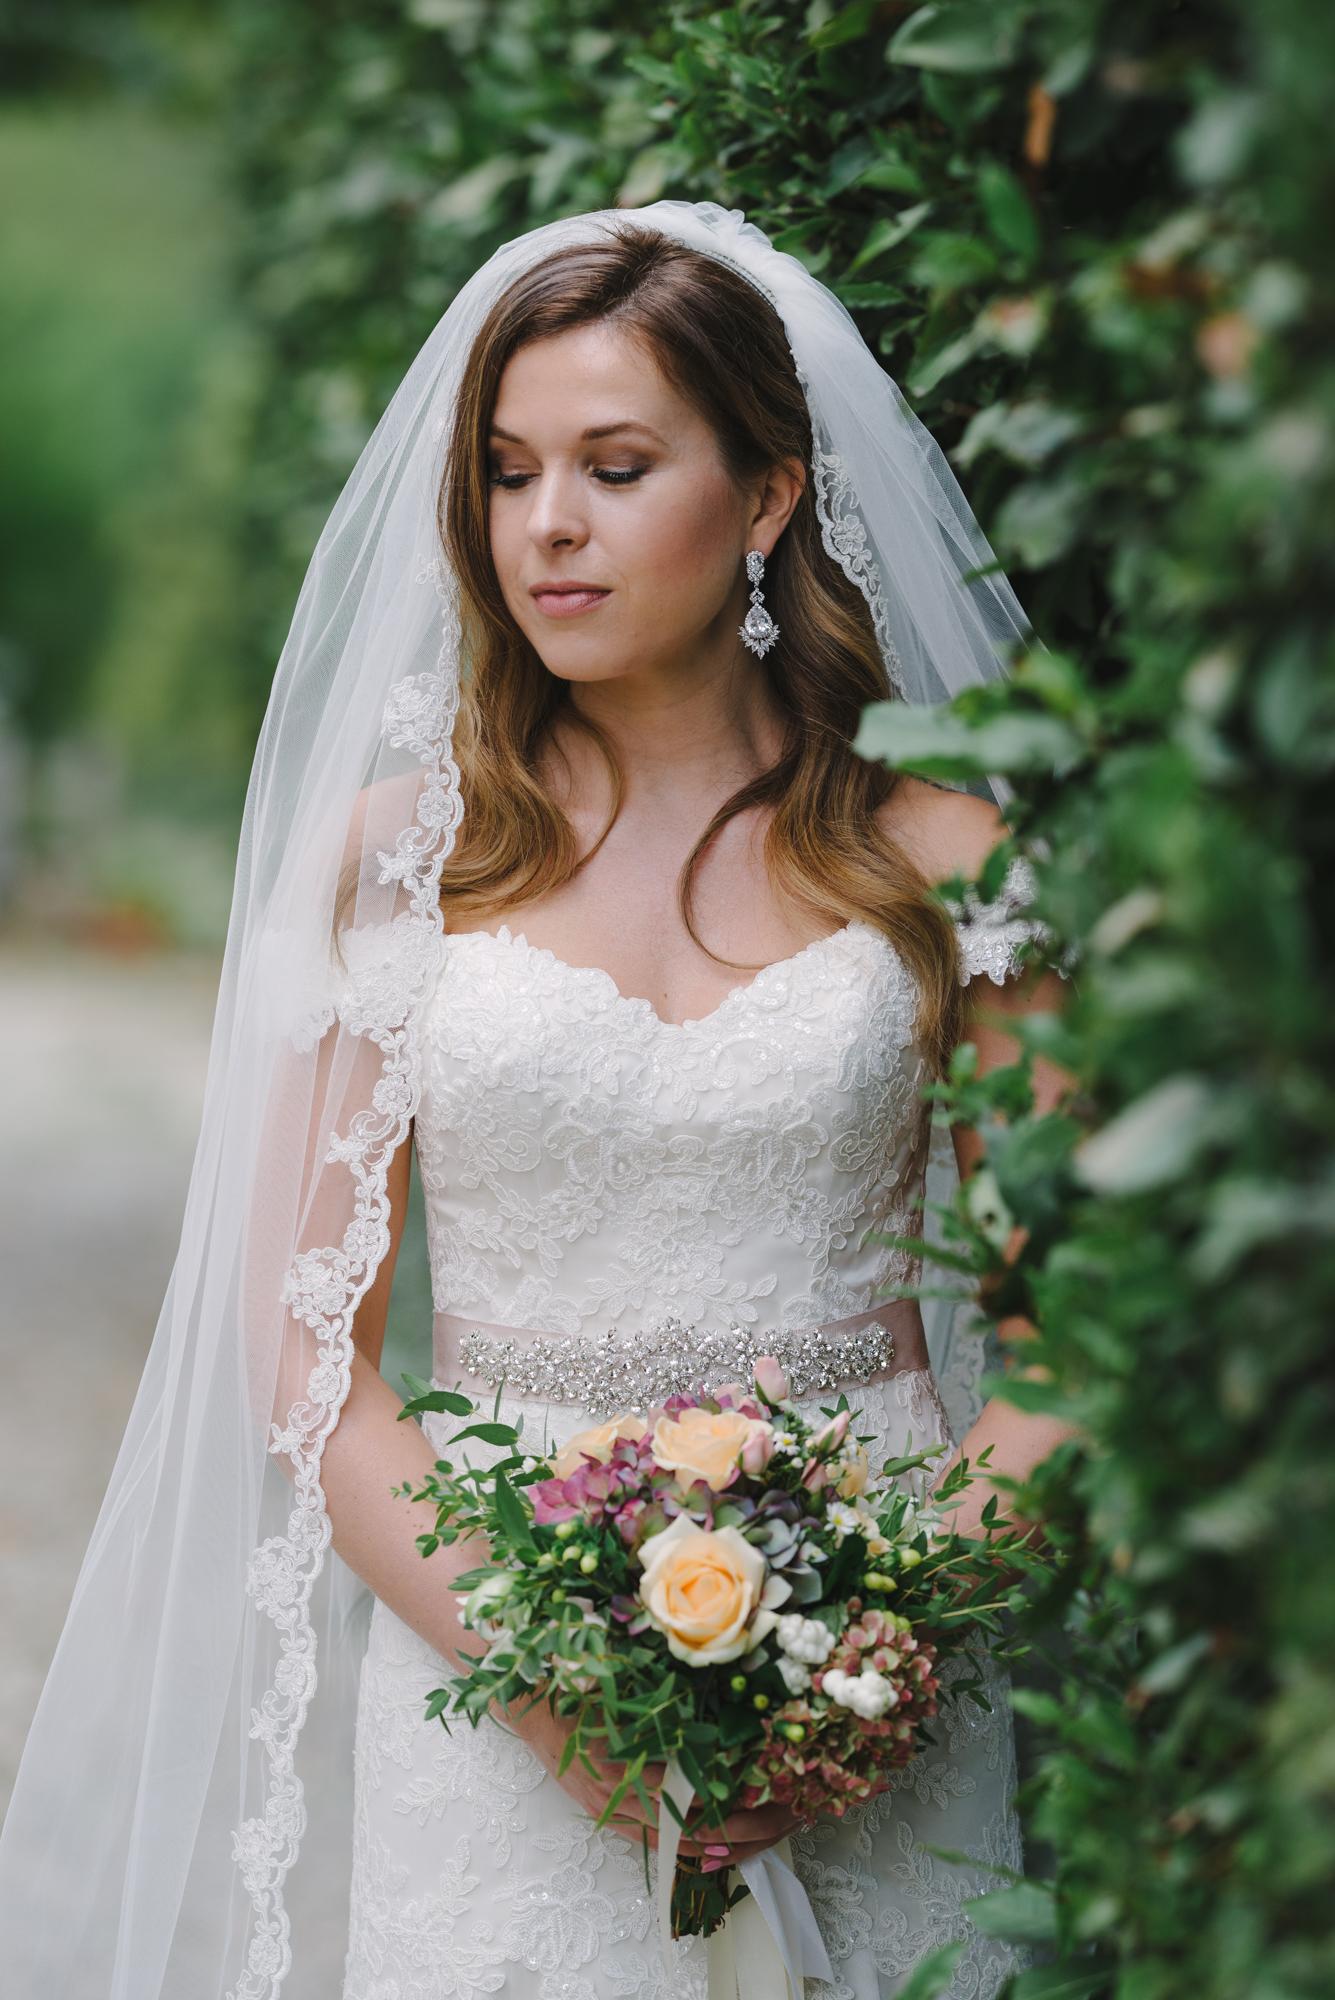 Wedding_Photographer_in_Tuscany_Italy-005.jpg